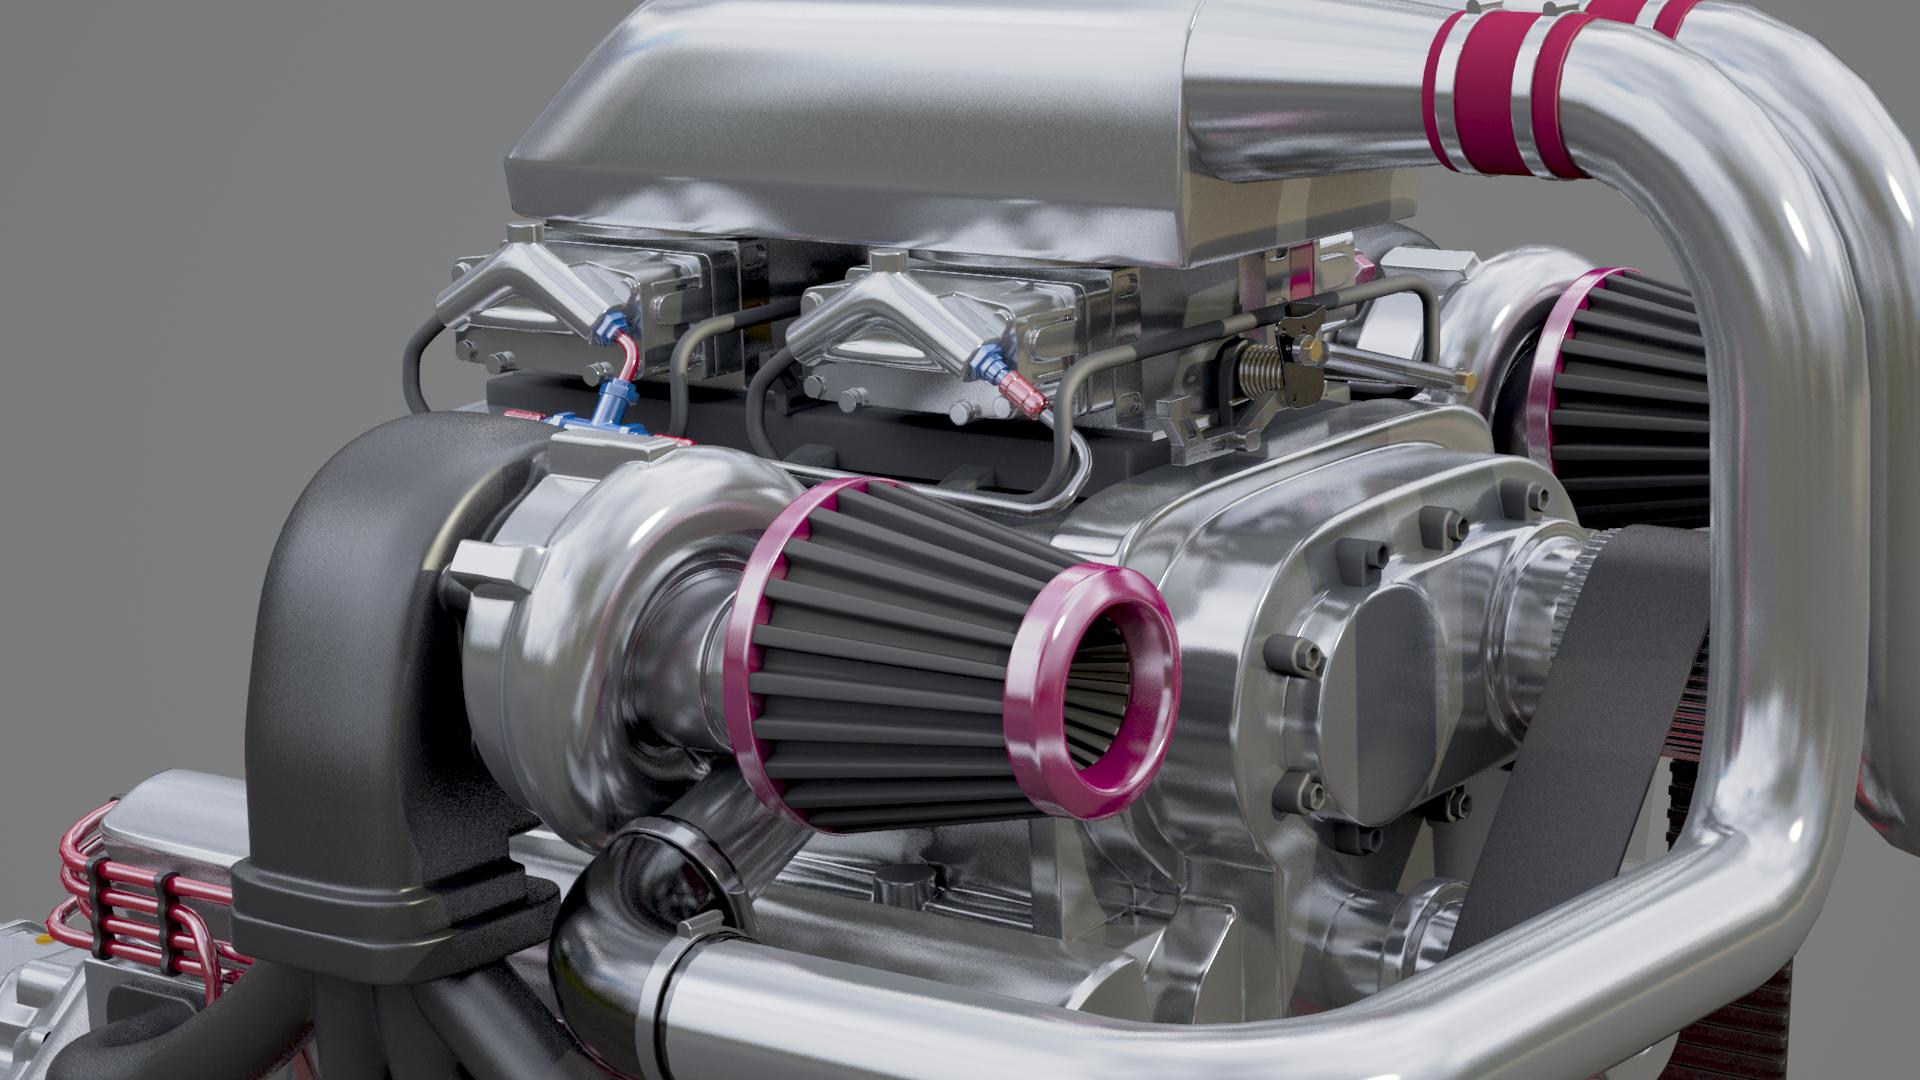 34' Chevy Hot Rod Build Thread — polycount